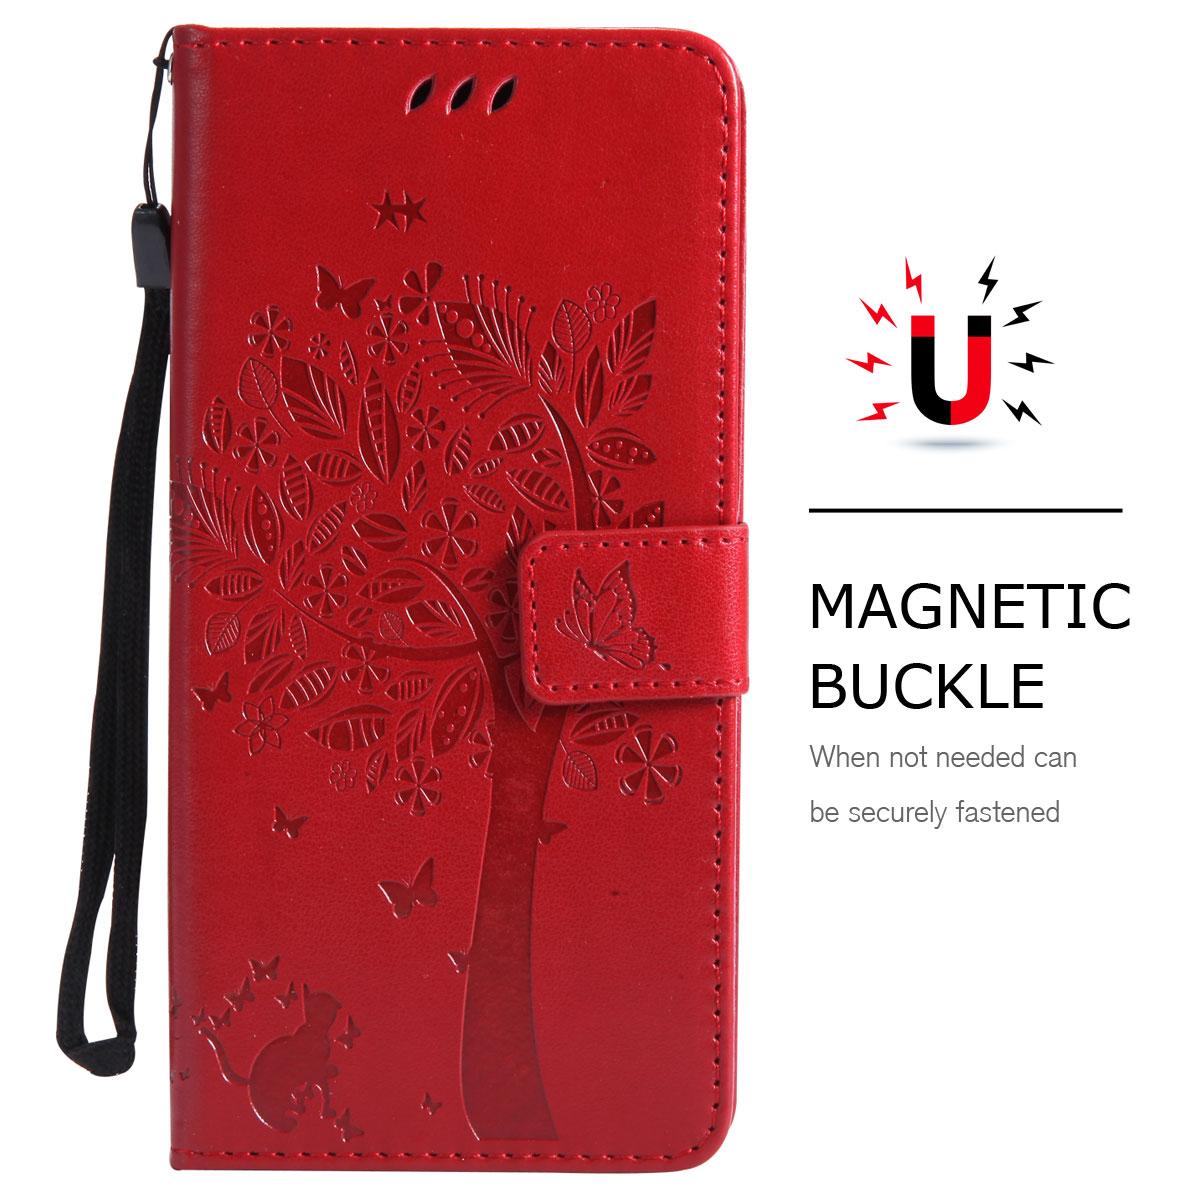 Magnetic-Leather-Credit-Card-Holder-Flip-Case-Cover-For-Google-Pixel-2-2-XL thumbnail 65